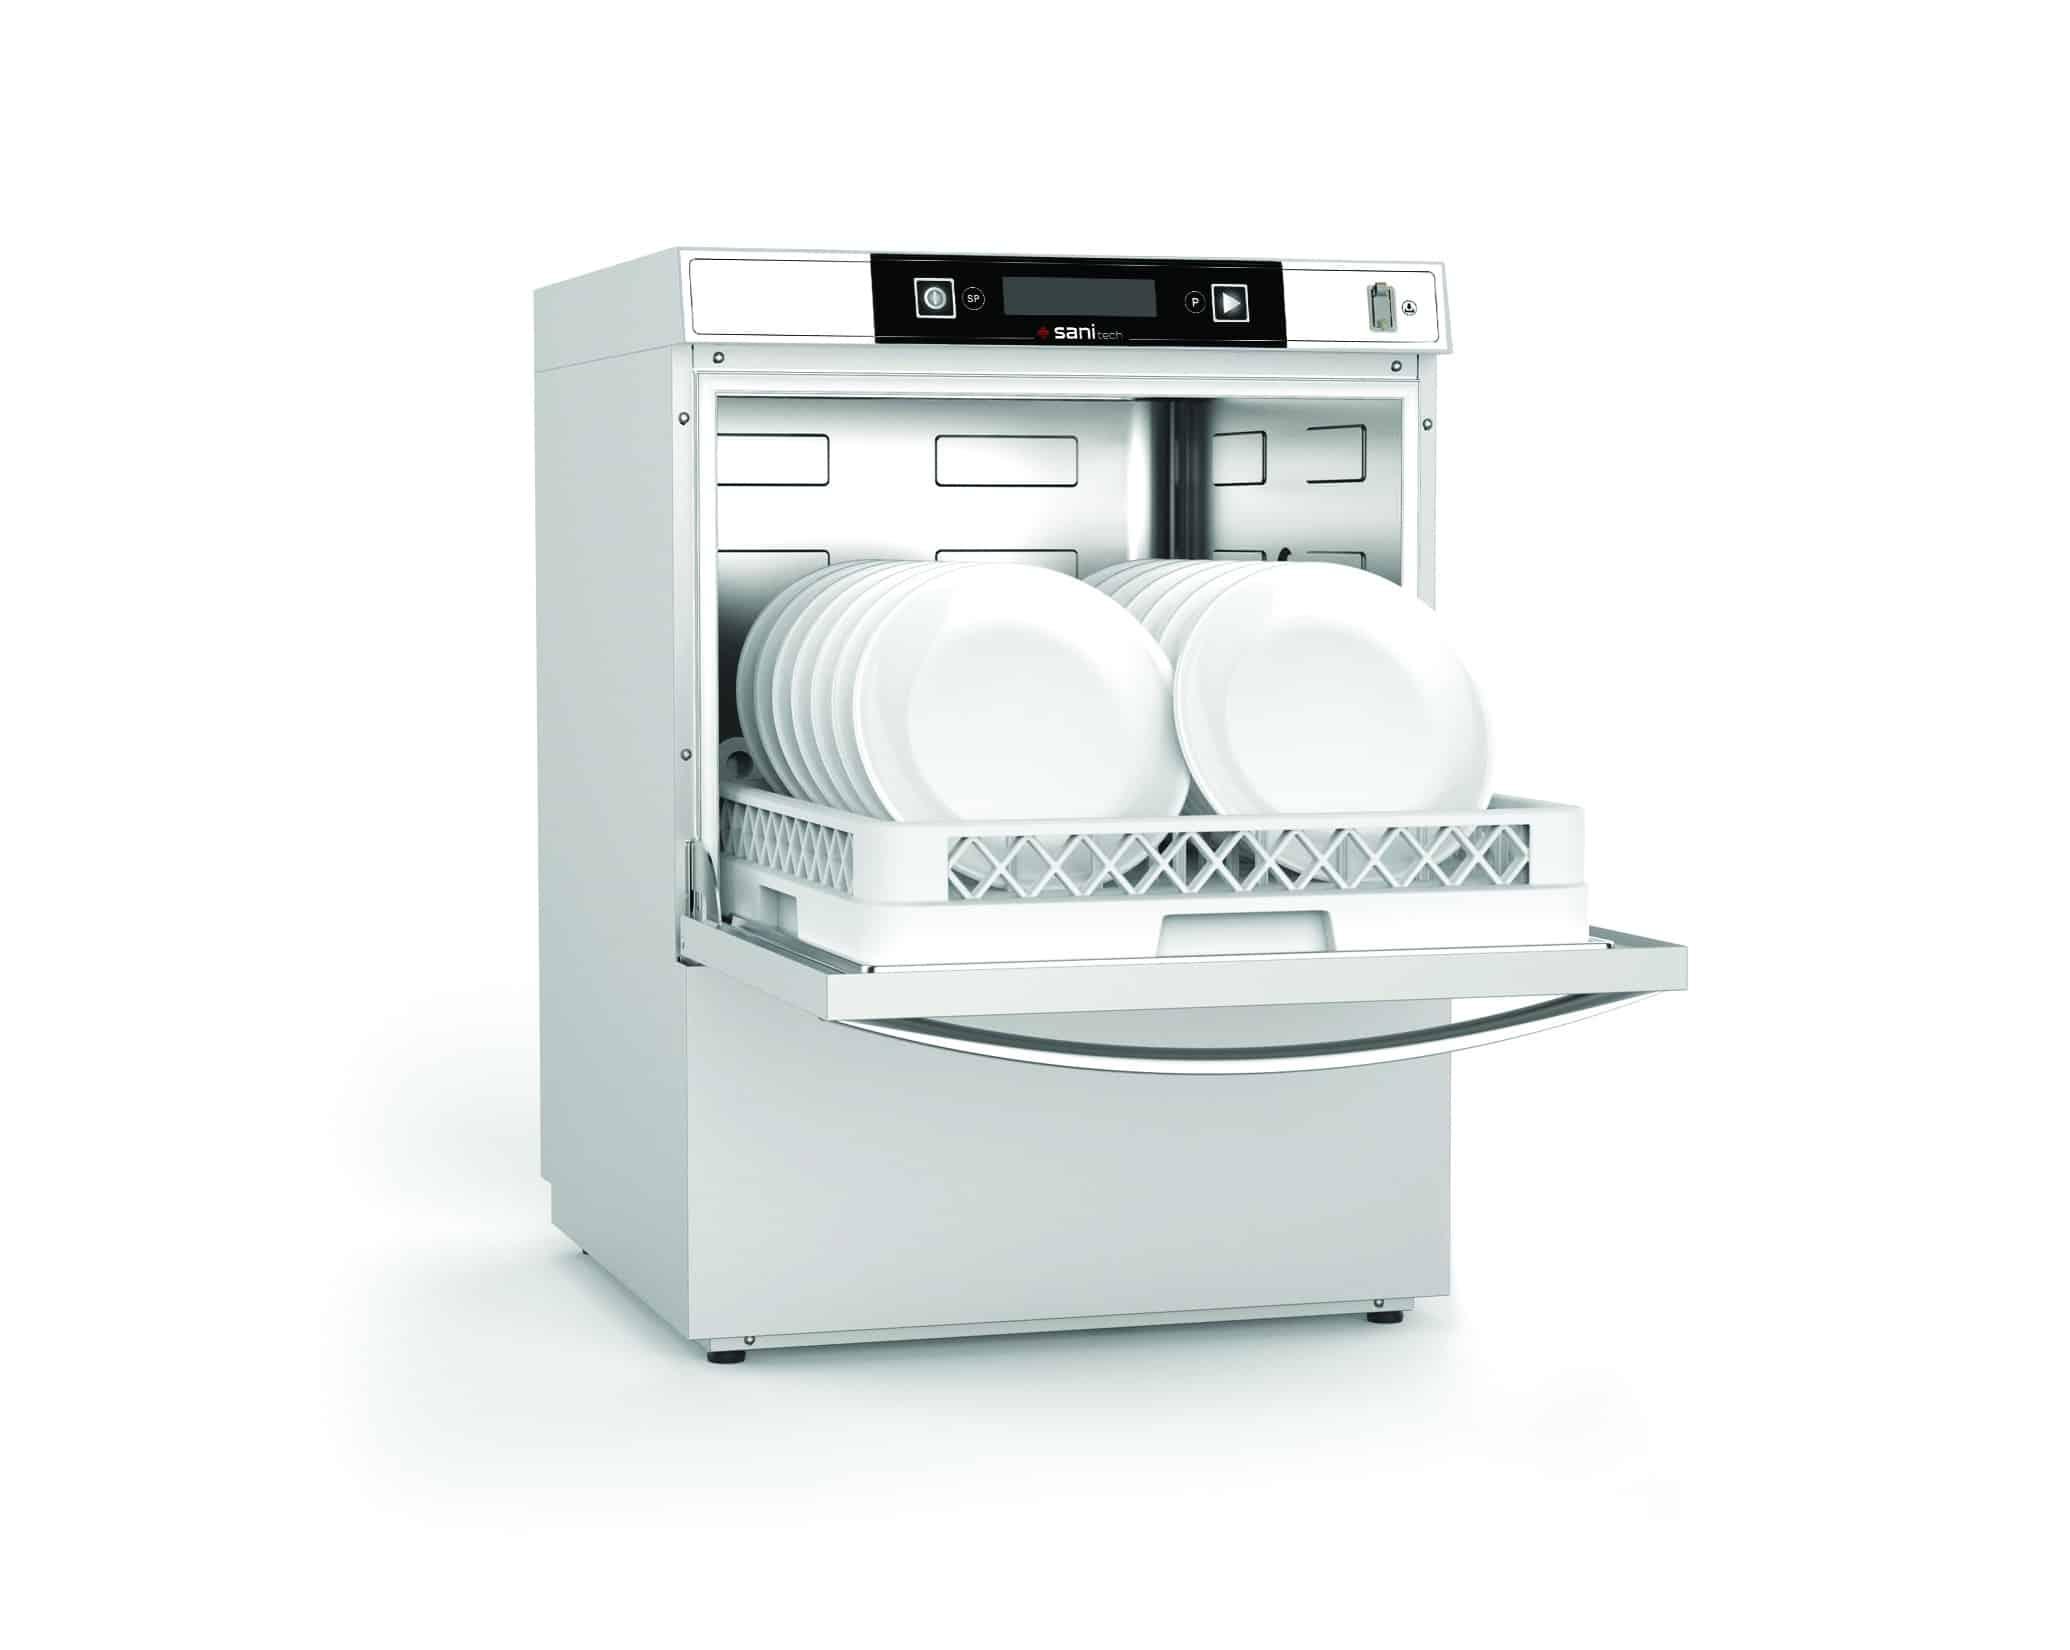 Colged Spülmaschinen: Desinfektion für noch mehr Hygiene: desinfiziert – zertifiziert